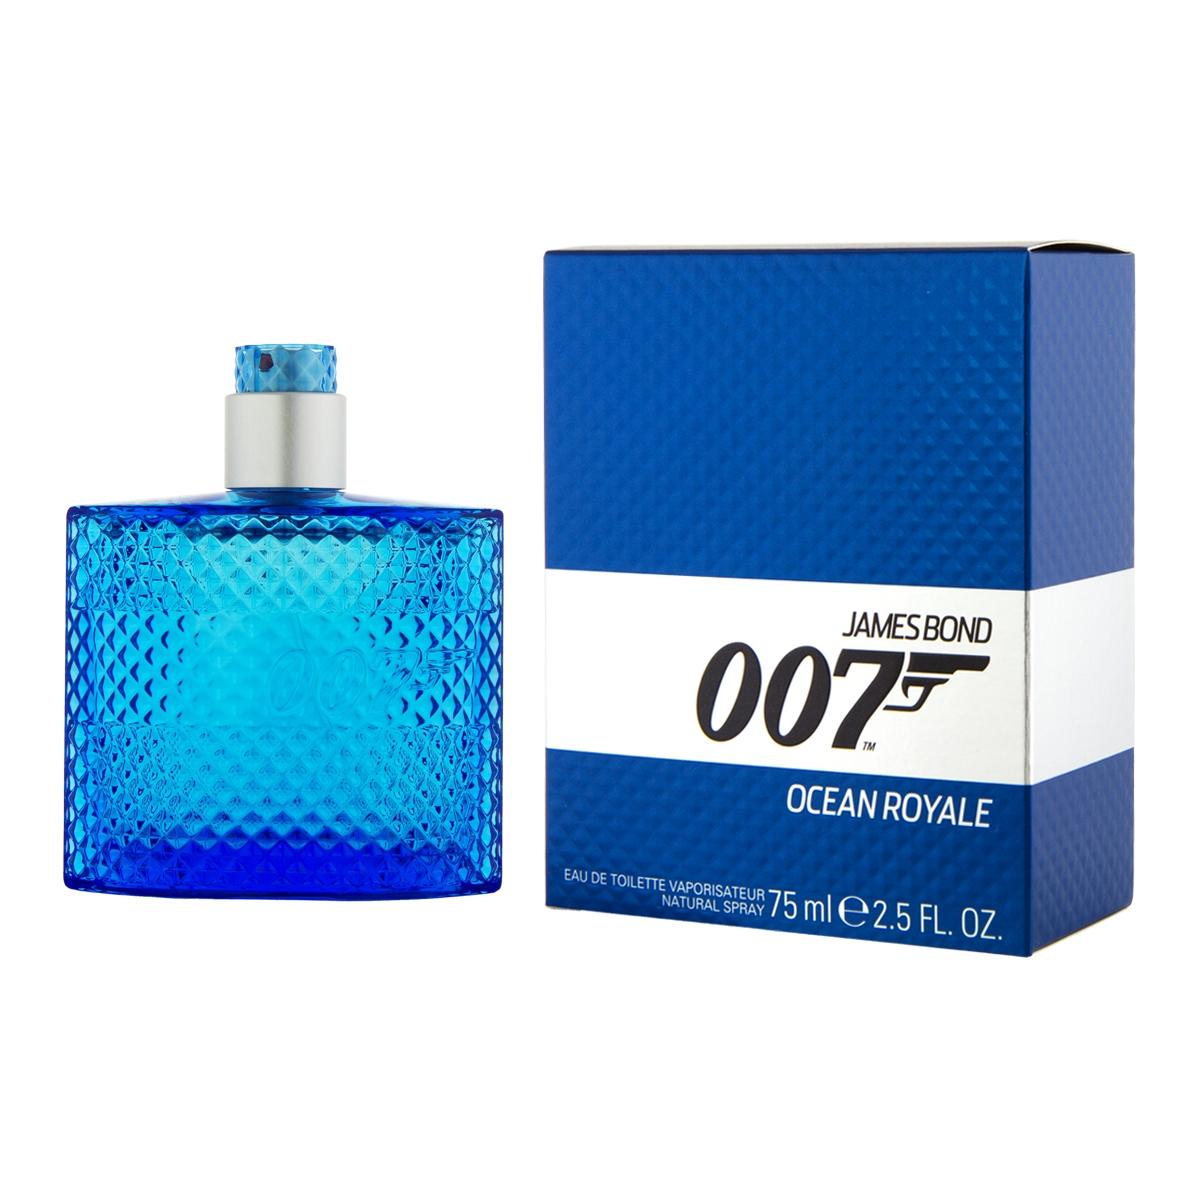 James Bond Ocean Royale